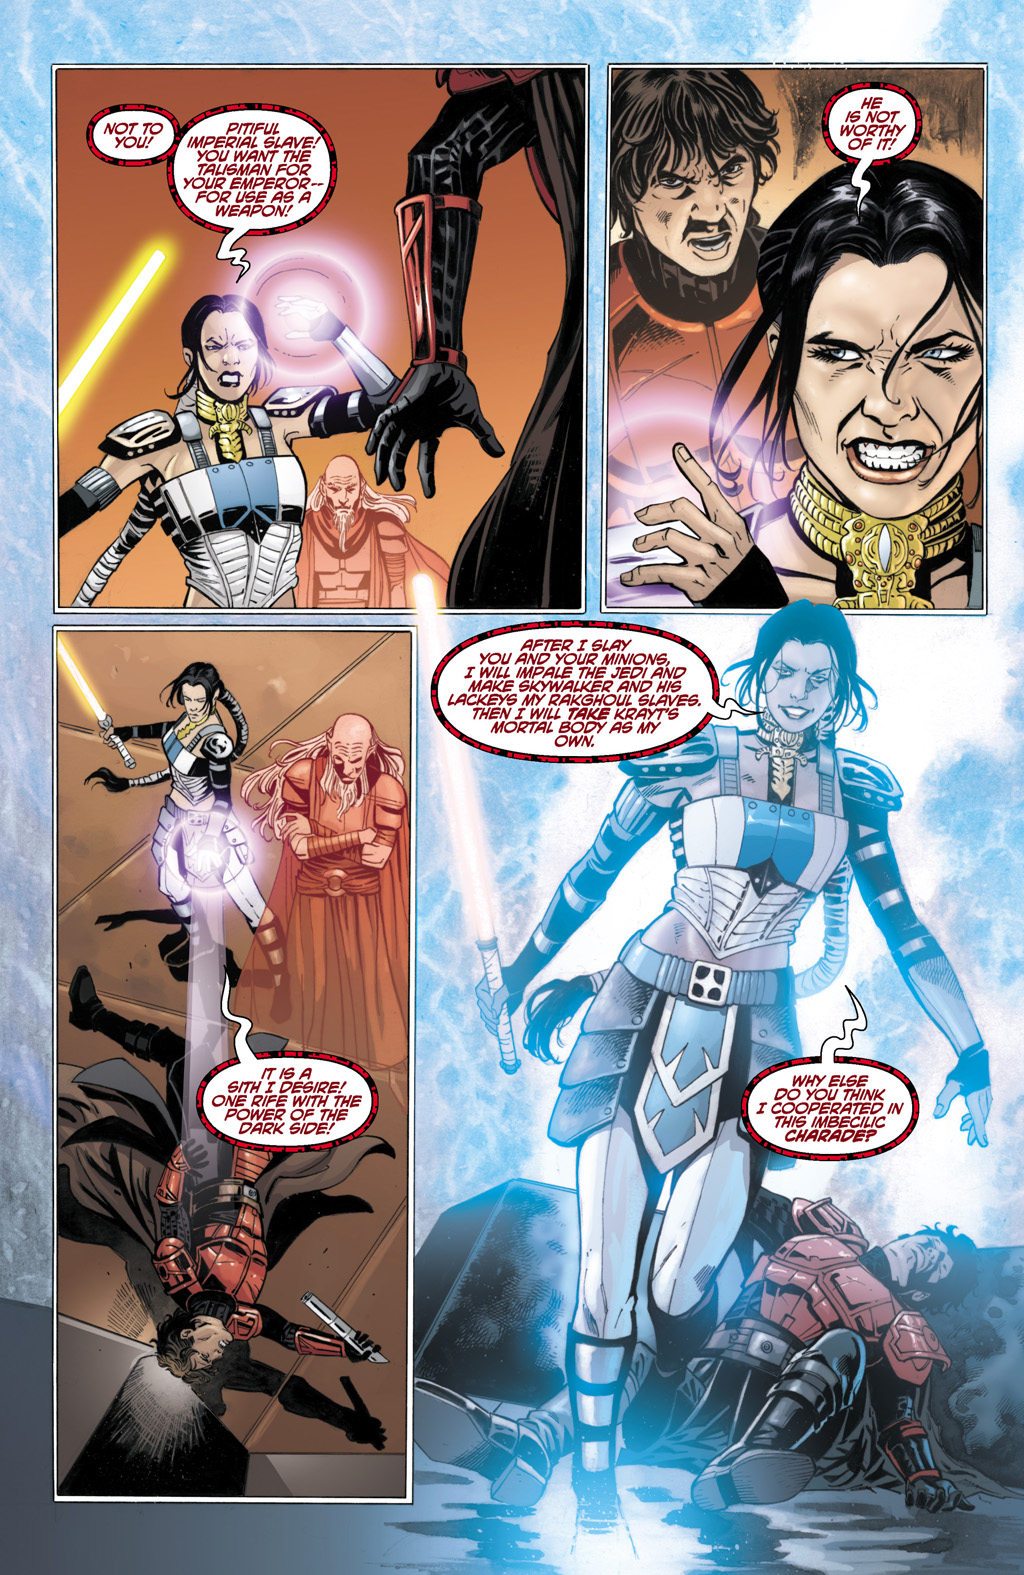 Darth Vader vs A'Sharad Hett - Page 3 BQ_aAMFvrlUg36BKiMY3CF0b_YmhYhI77RH2TIzp_3rsgvZIANGUrtdO9xRyhH-r_BxDwi3qeSNL_lg9EYILfz-cmtvdldN1U2fkhZ8A0AJQx4gv0i61rJ5JgKVnFQHeNhU0rSrq